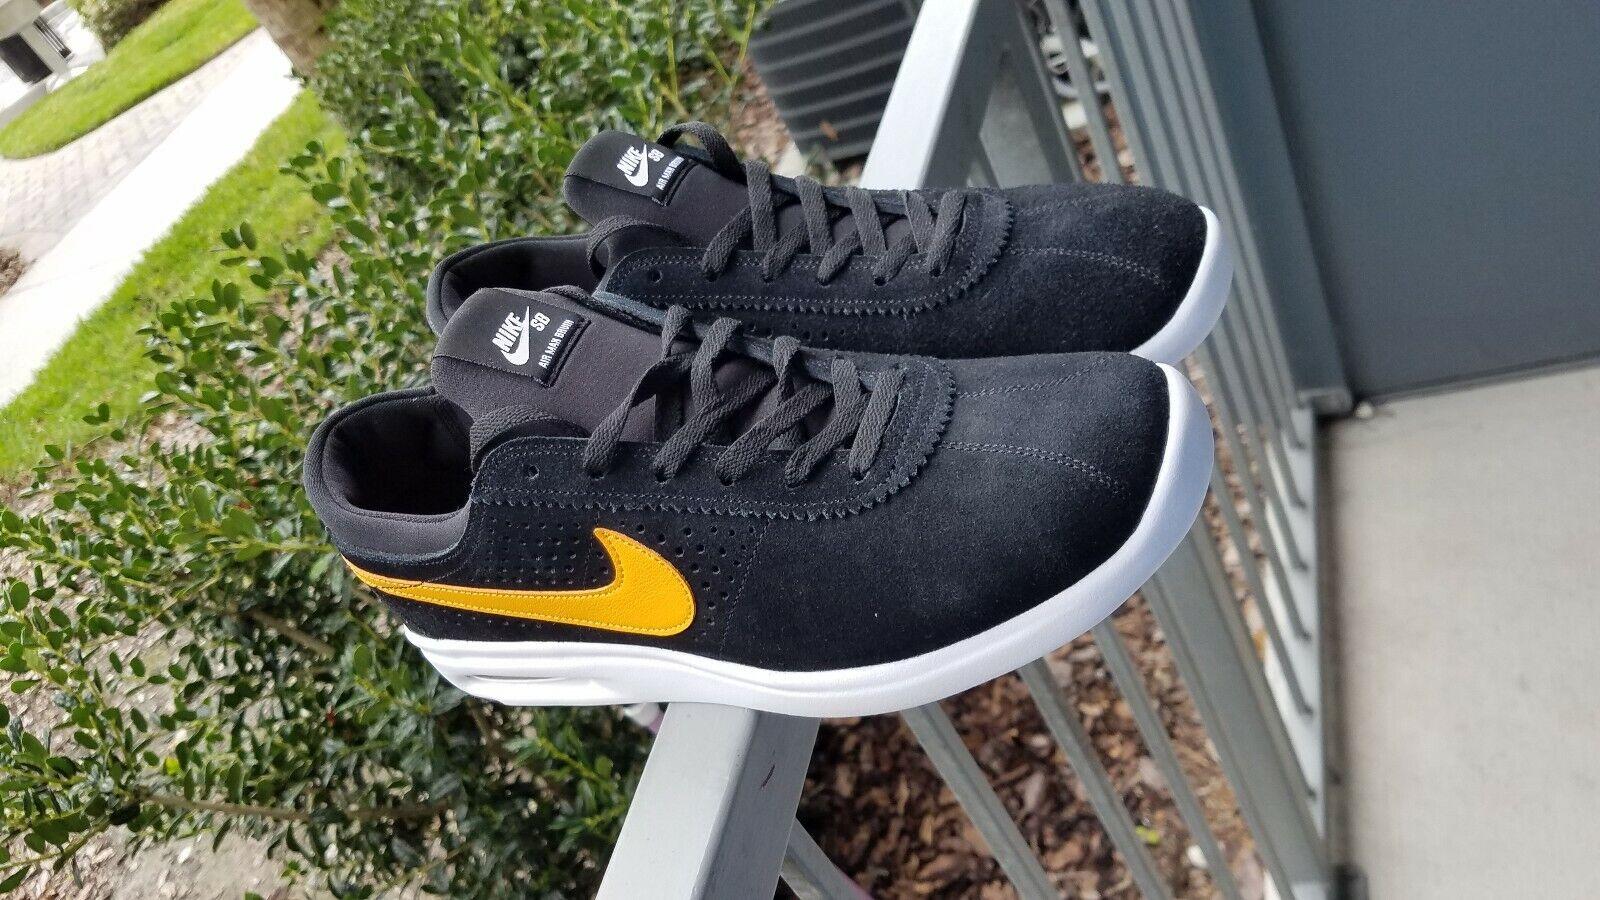 Nike Mens SB Air Max Bruin Bruin Bruin Vapor  shoes 882097-081 Sz 10.5 b88437